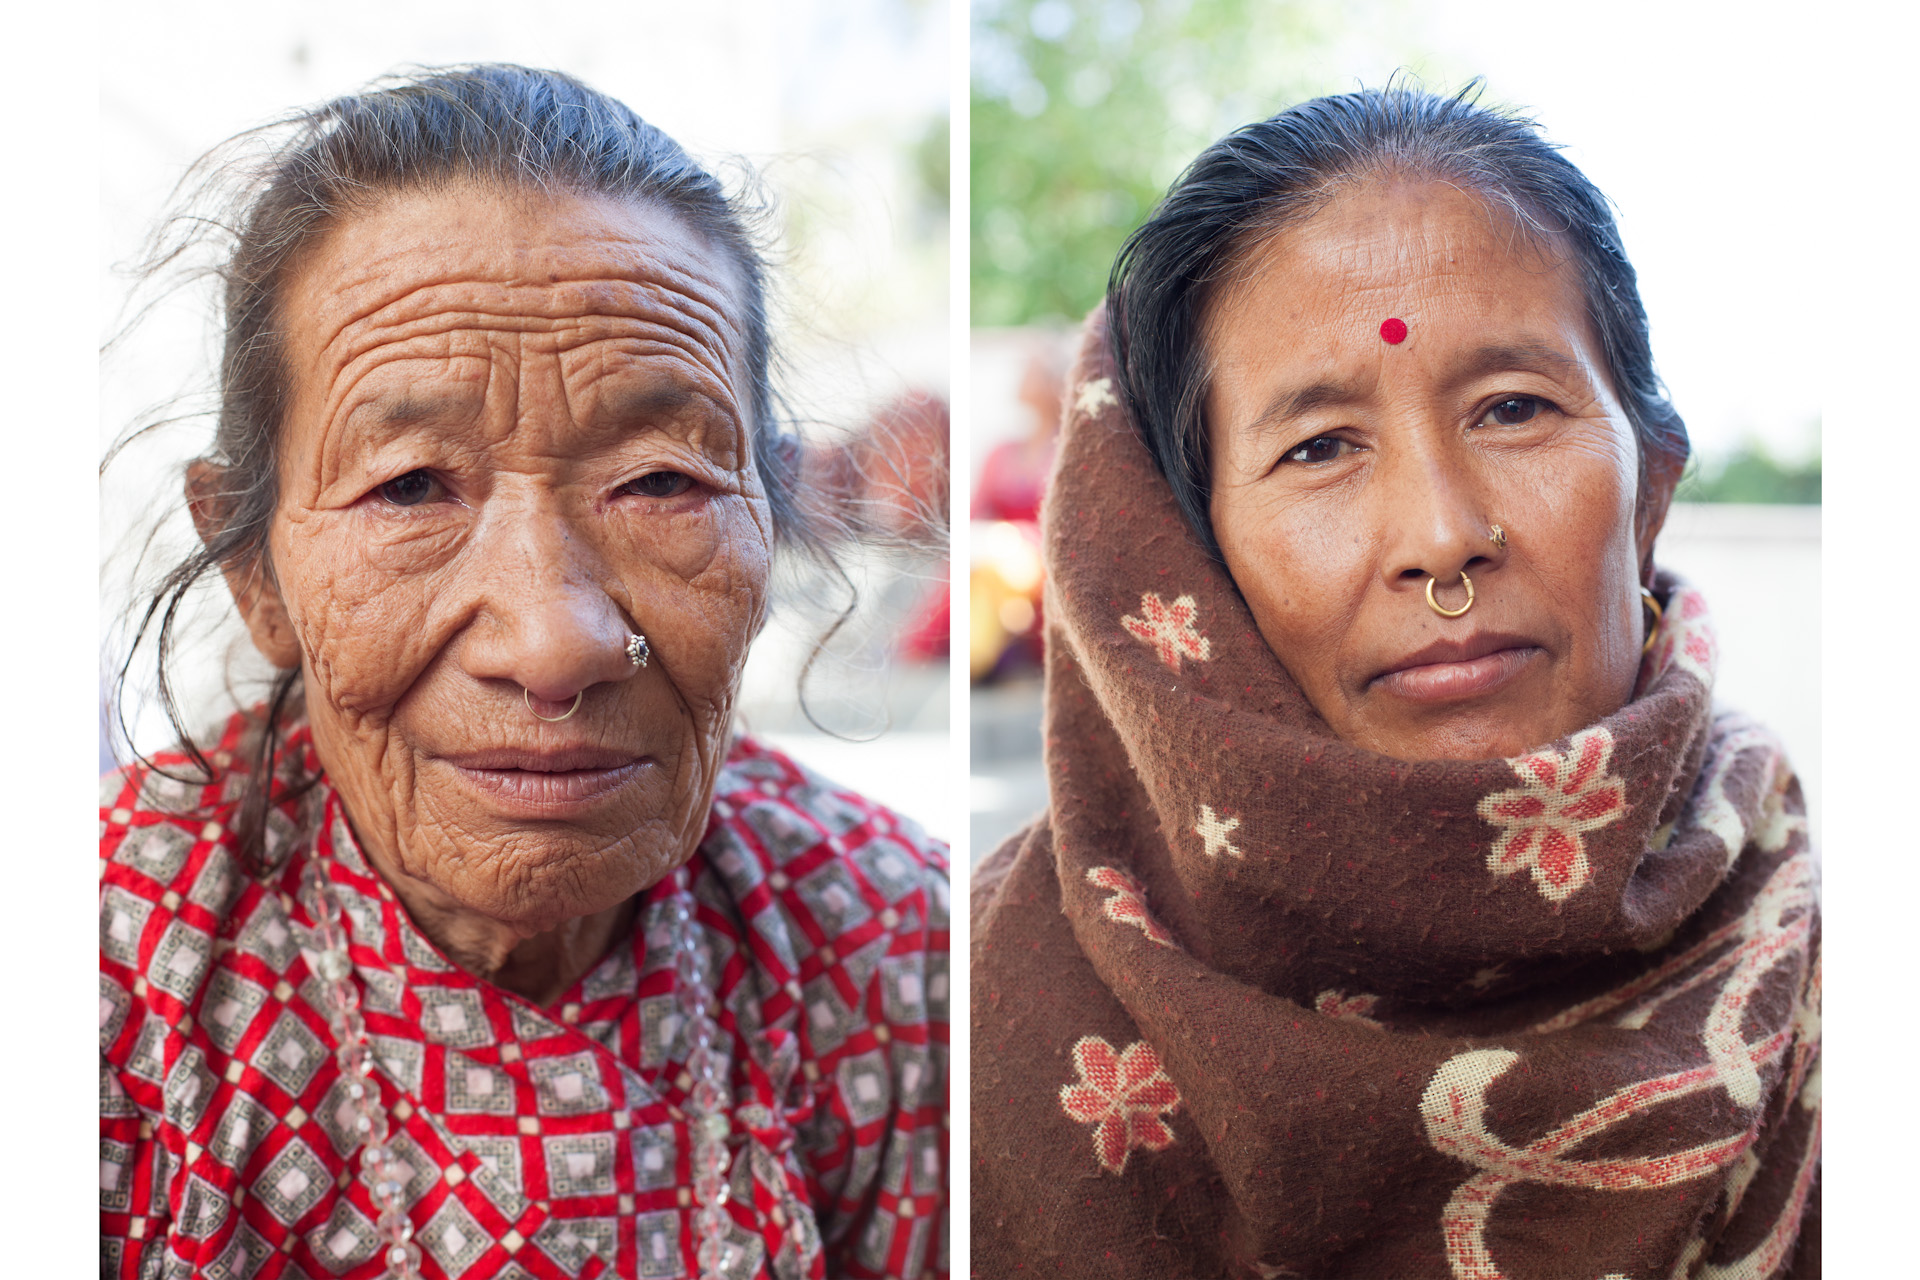 Humanitarian-Portrait-Acupuncture-Mindful-Medicine-Nepal-Namo-buddha-05.JPG